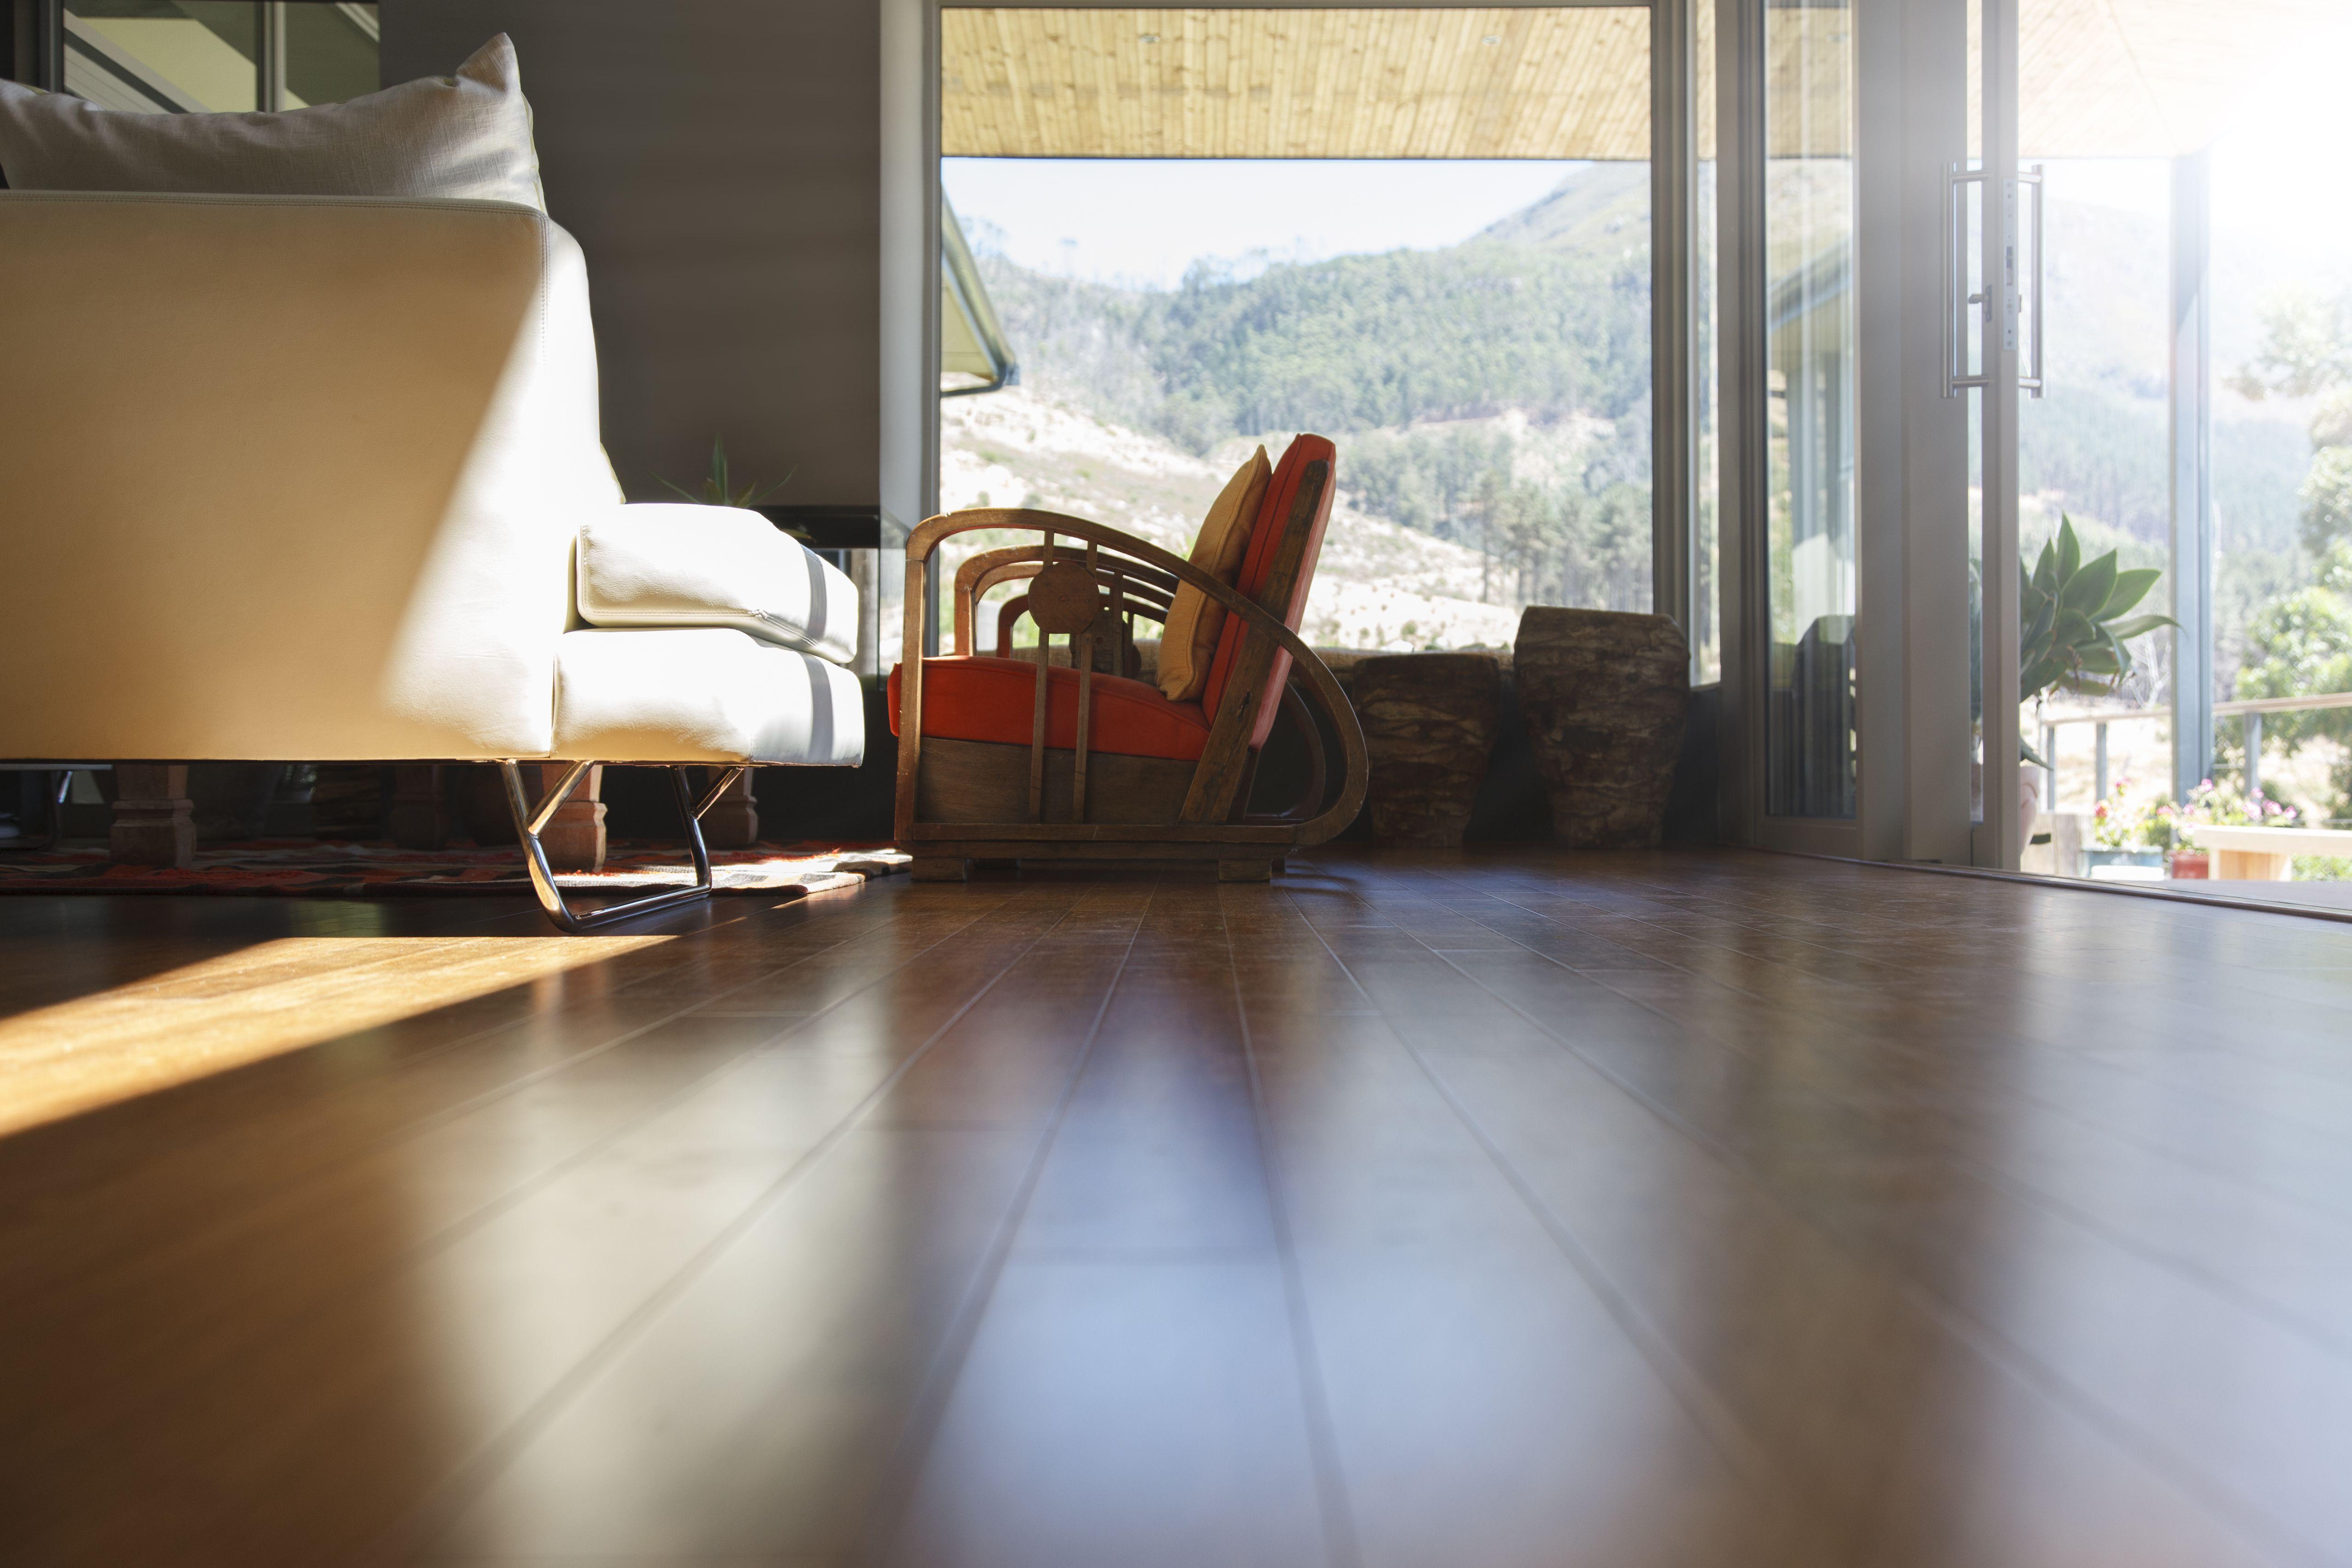 20 Lovely 2 1 4 Engineered Hardwood Flooring 2021 free download 2 1 4 engineered hardwood flooring of types of engineered flooring from premium hardwoods with regard to living room interior hard wood floor and sofa 525439899 5a764f241d64040037603c15